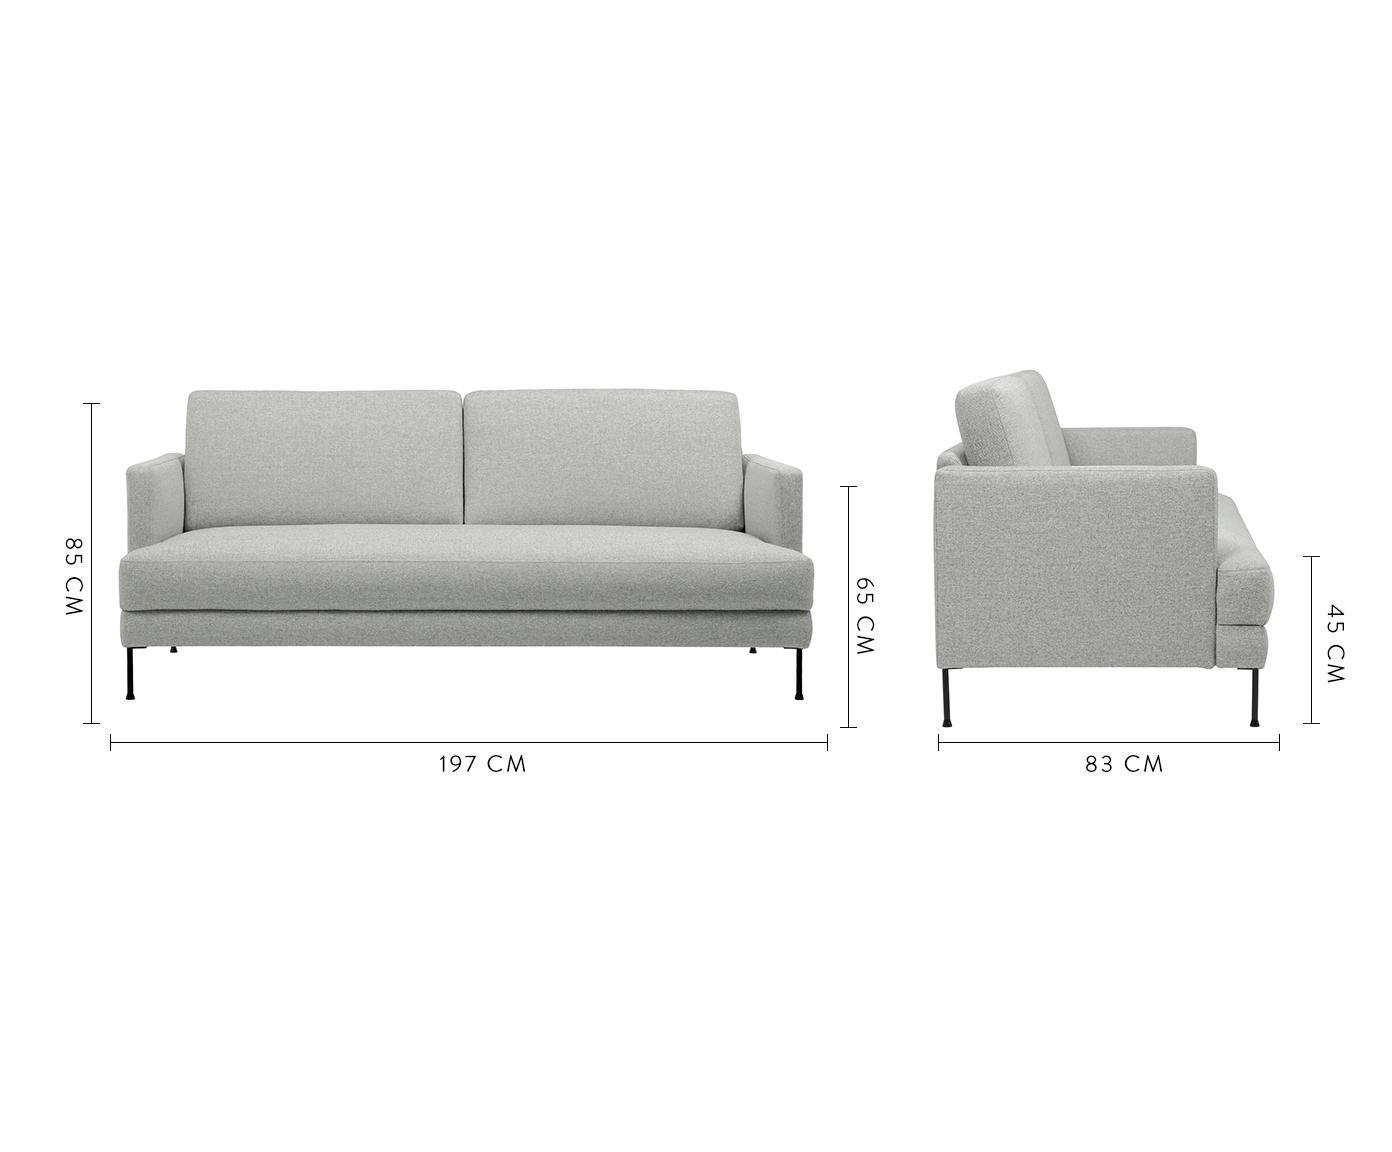 Sofa Fluente (3-Sitzer), Bezug: Polyester 45.000 Scheuert, Gestell: Massives Kiefernholz, Füße: Metall, lackiert, Webstoff Hellgrau, 197 x 85 cm